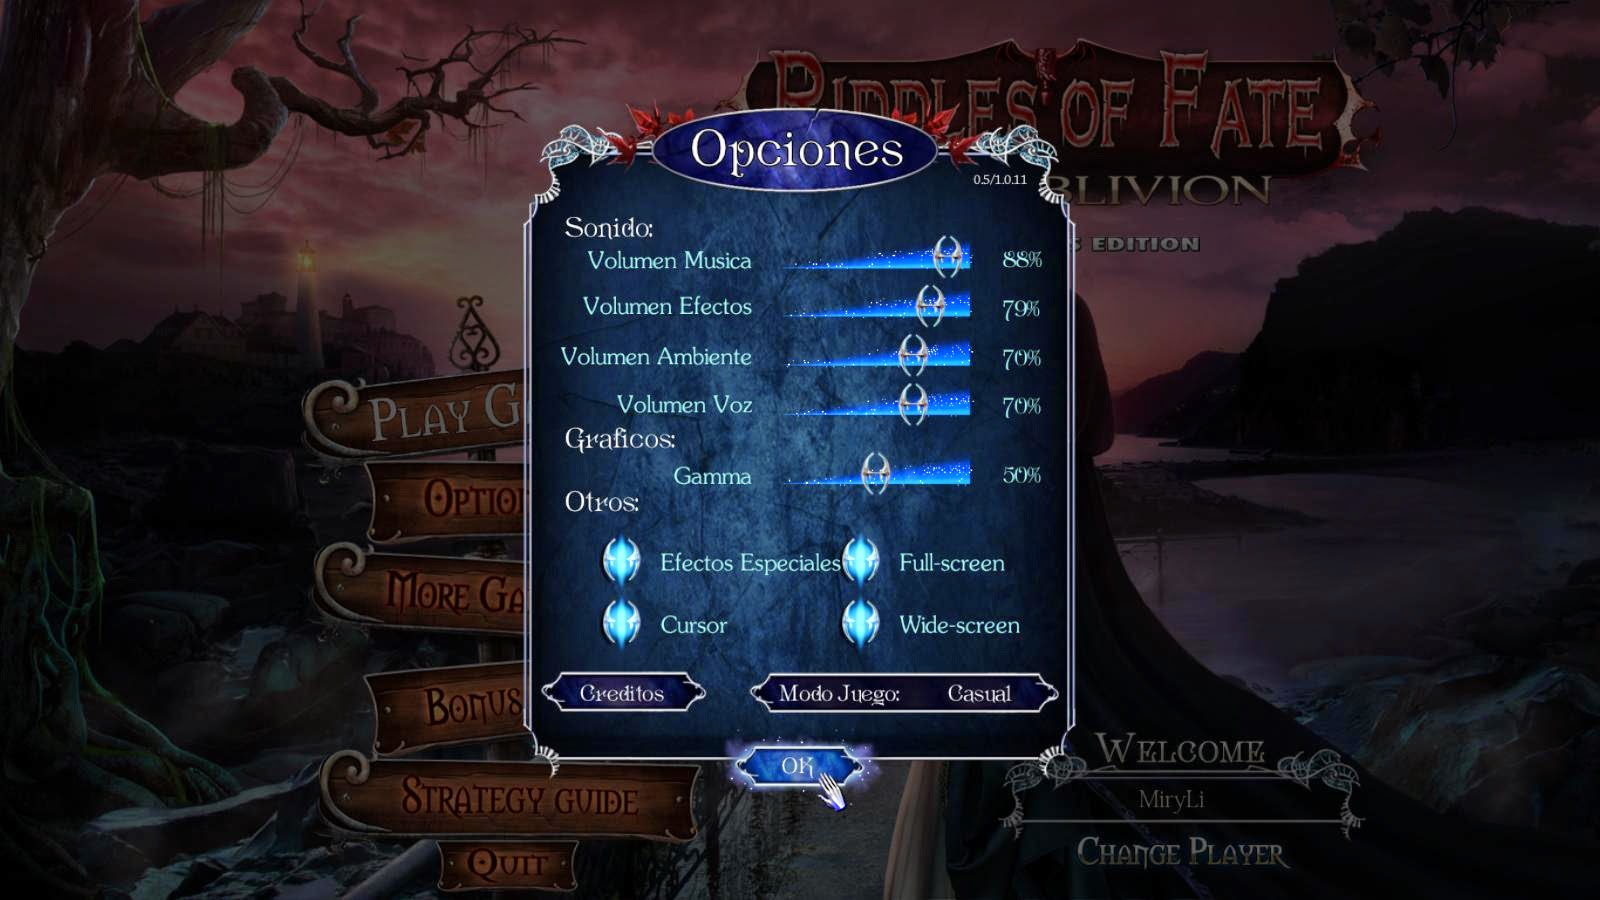 Riddles of fate into oblivion - edición de coleccionista